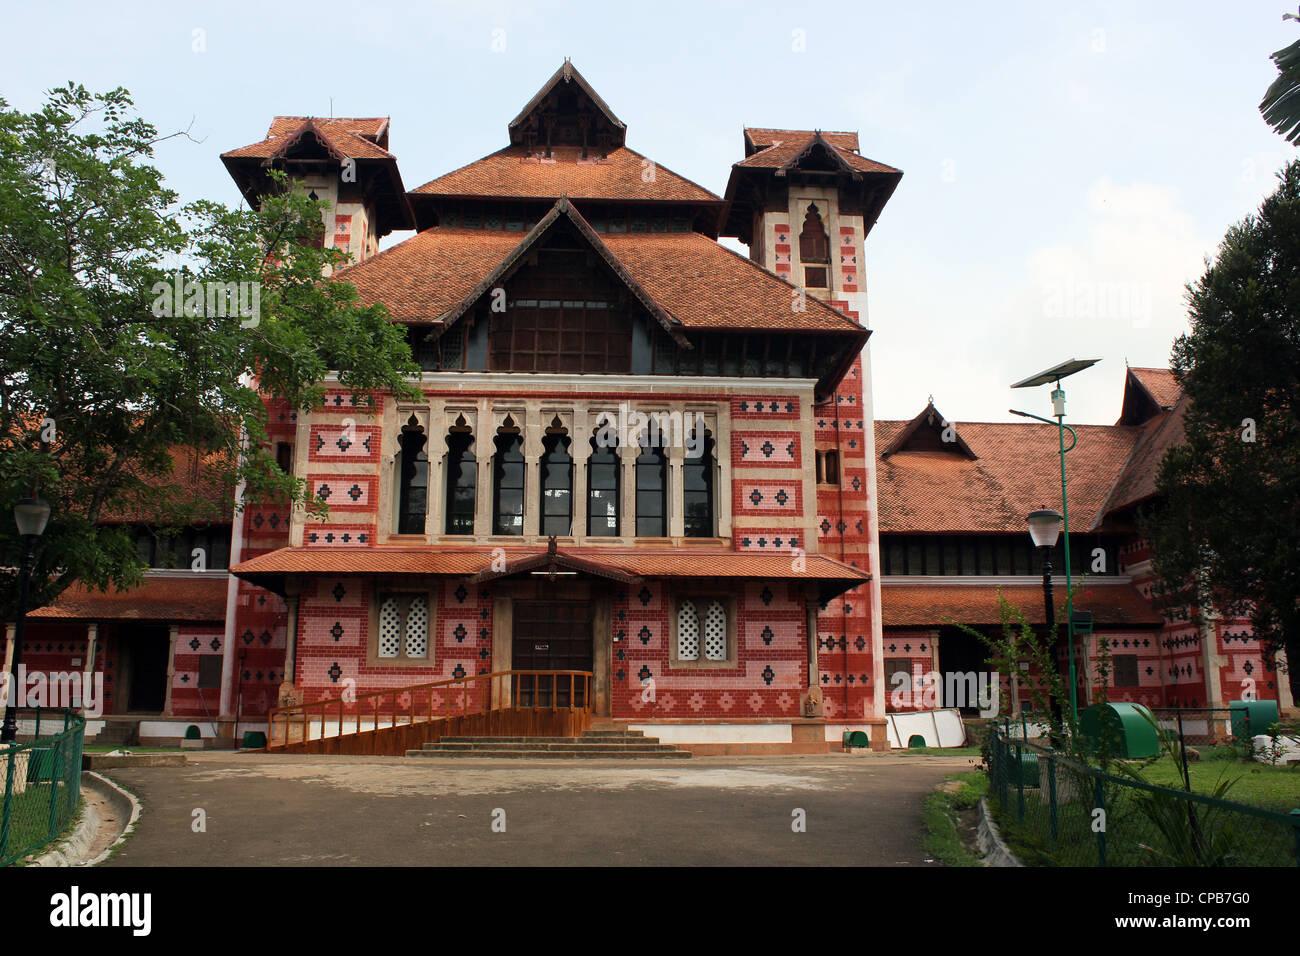 Napier Museum of Art and Natural history Trivandrum Kerala India Stock Photo